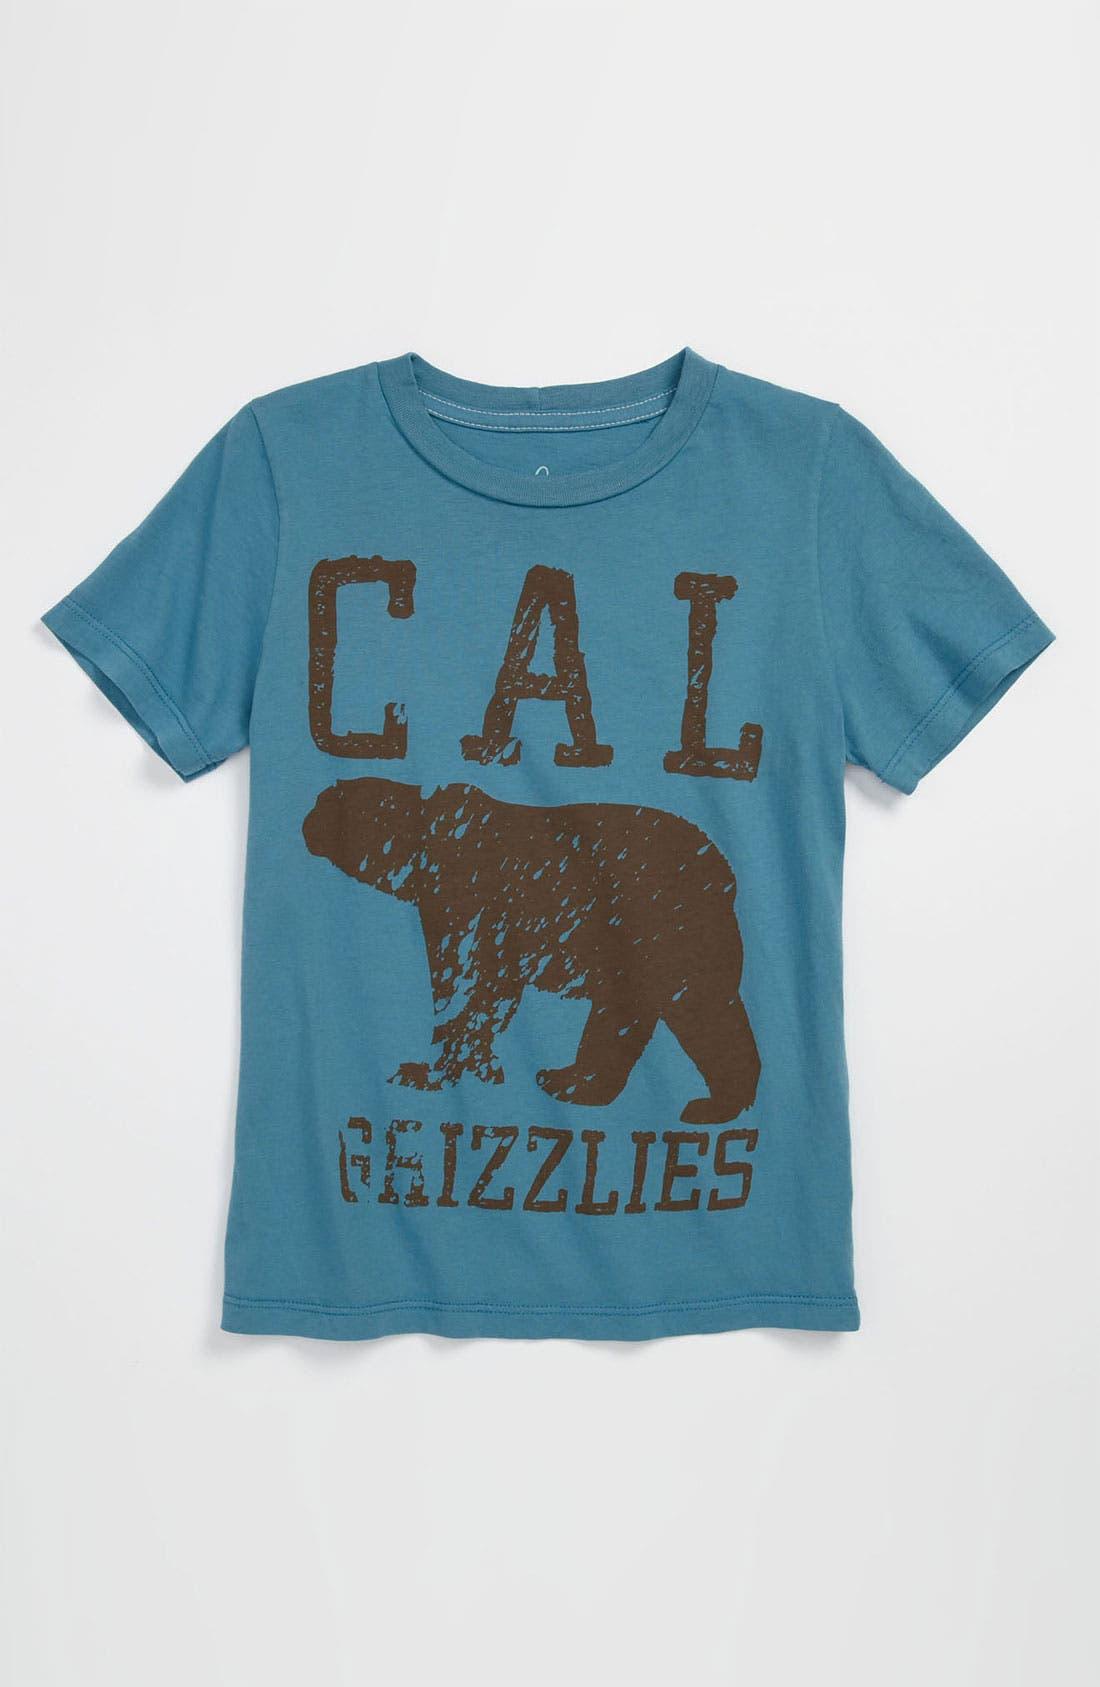 Alternate Image 1 Selected - Peek 'California Grizzlies' T-Shirt (Toddler, Little Boys & Big Boys)